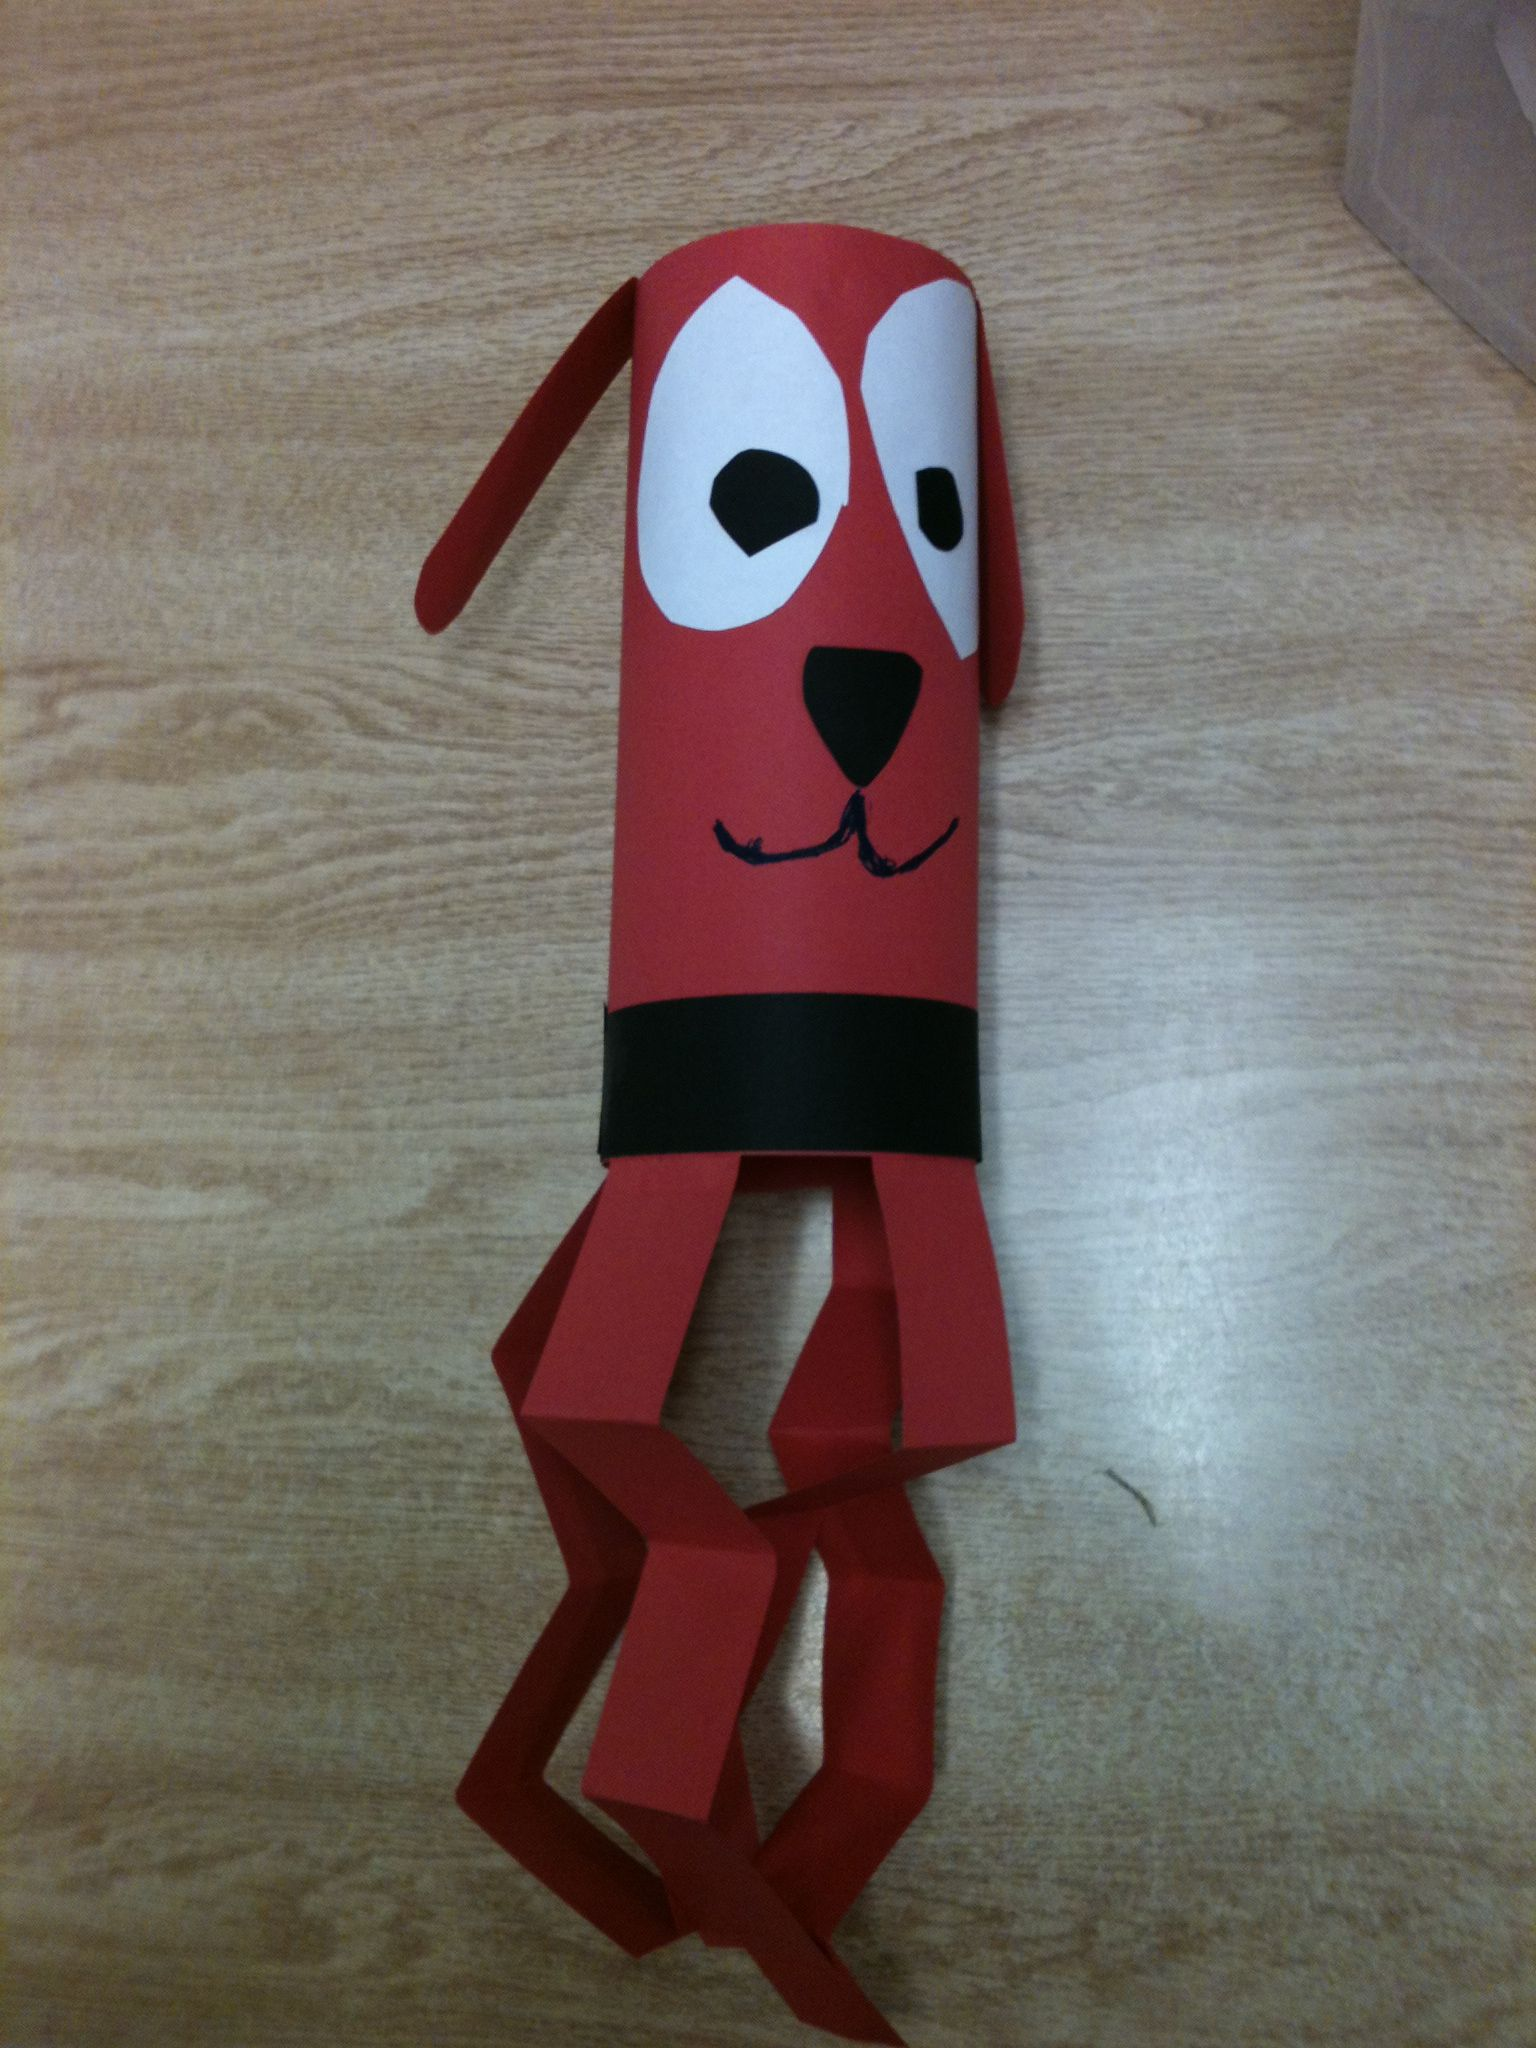 Clifford Big Red Dog Wind Socks. Class Craftiness